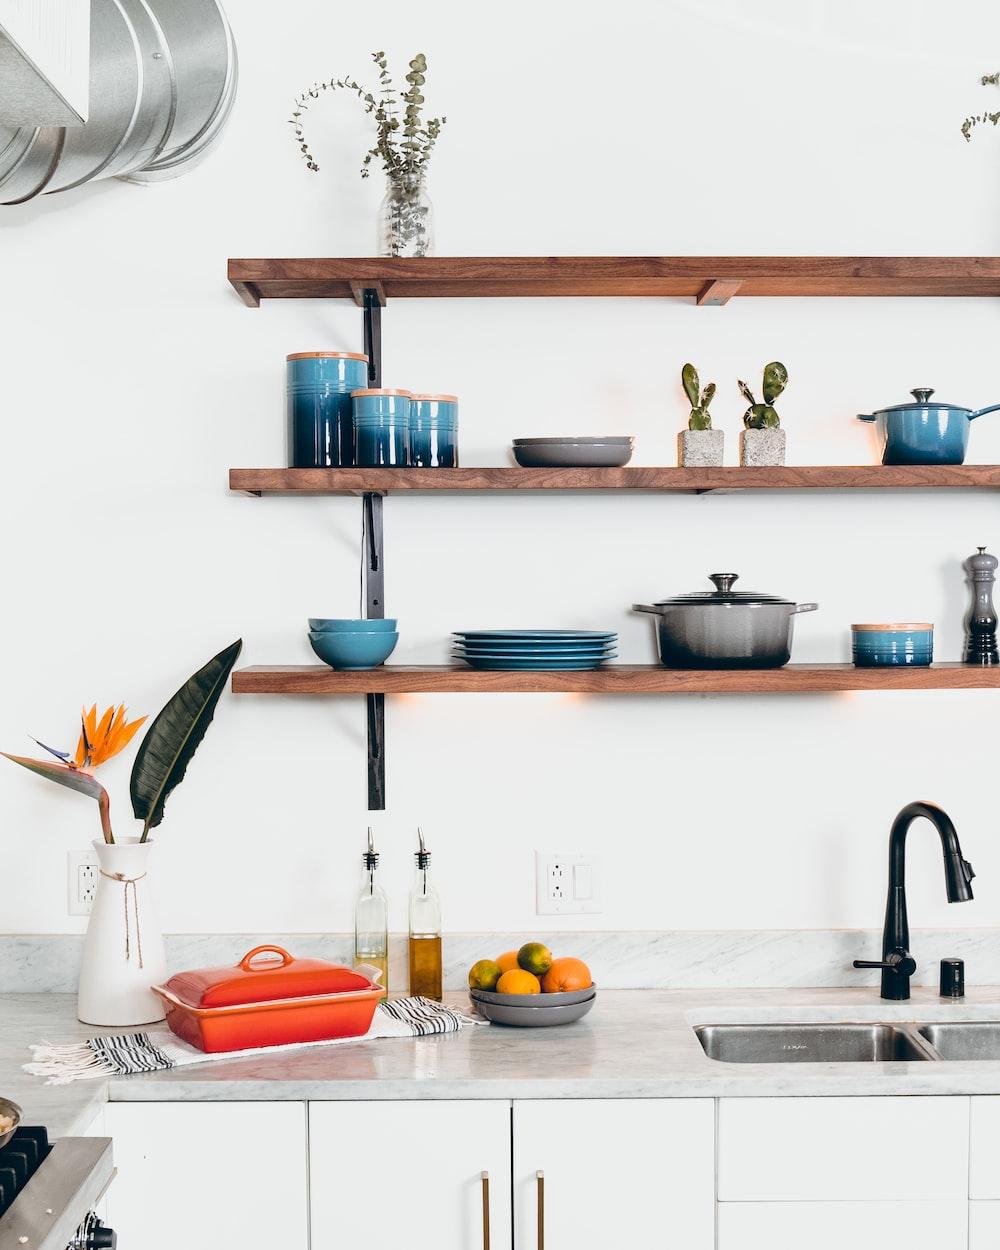 blue ceramic dinnerware on rack